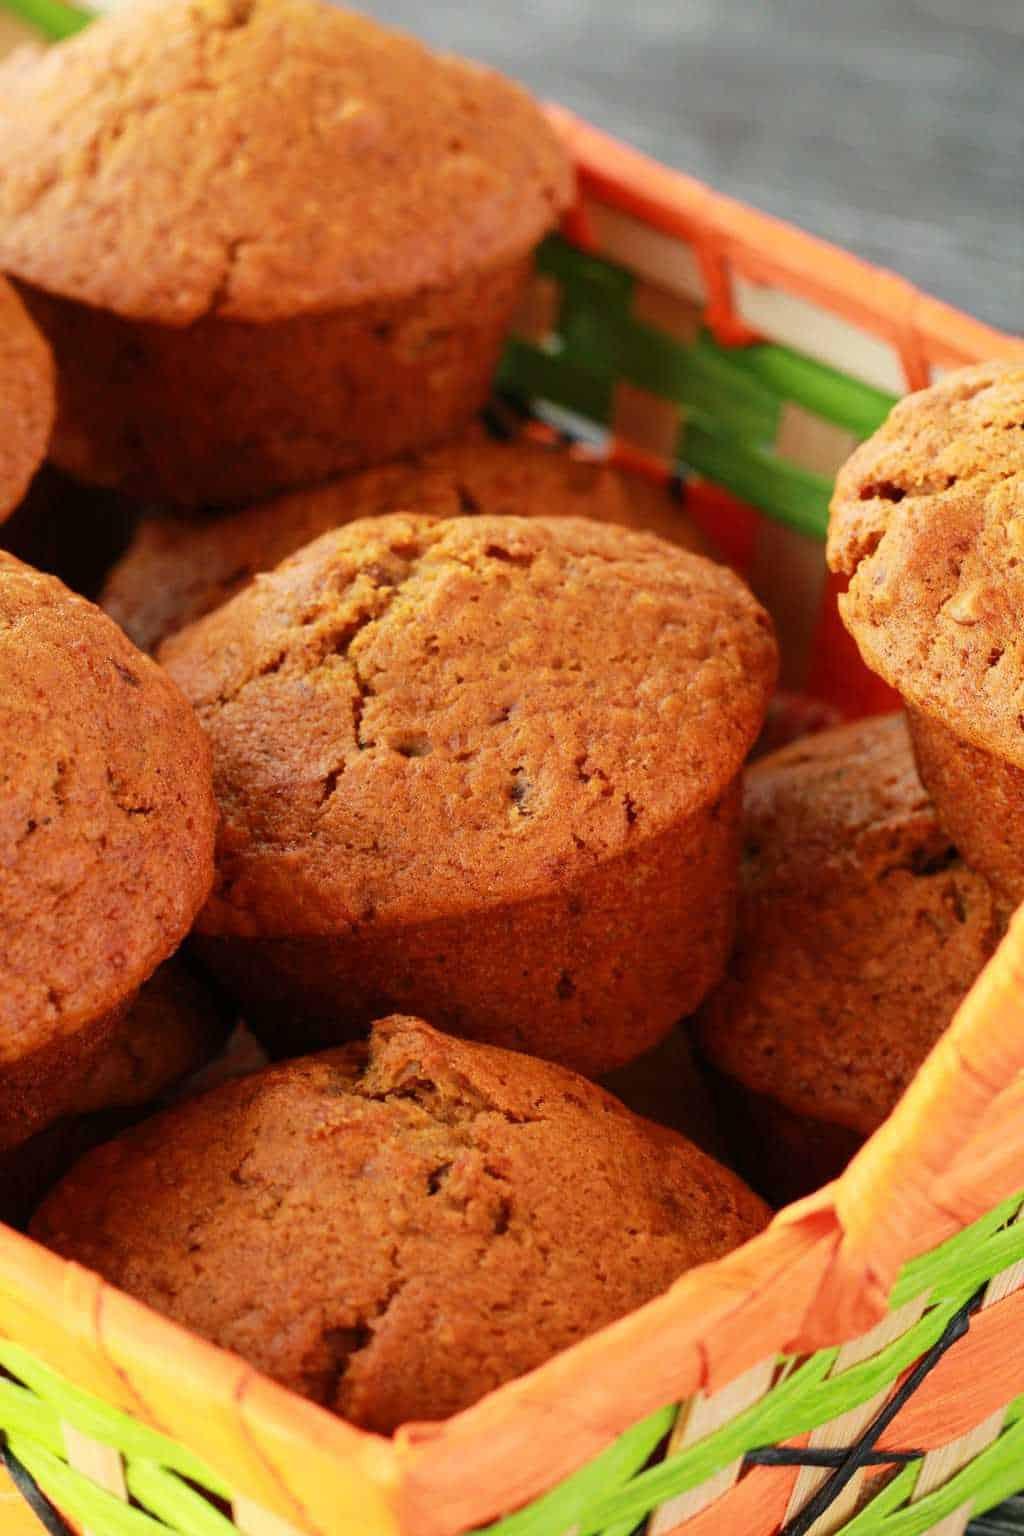 Vegan pumpkin muffins in a green and orange woven basket.